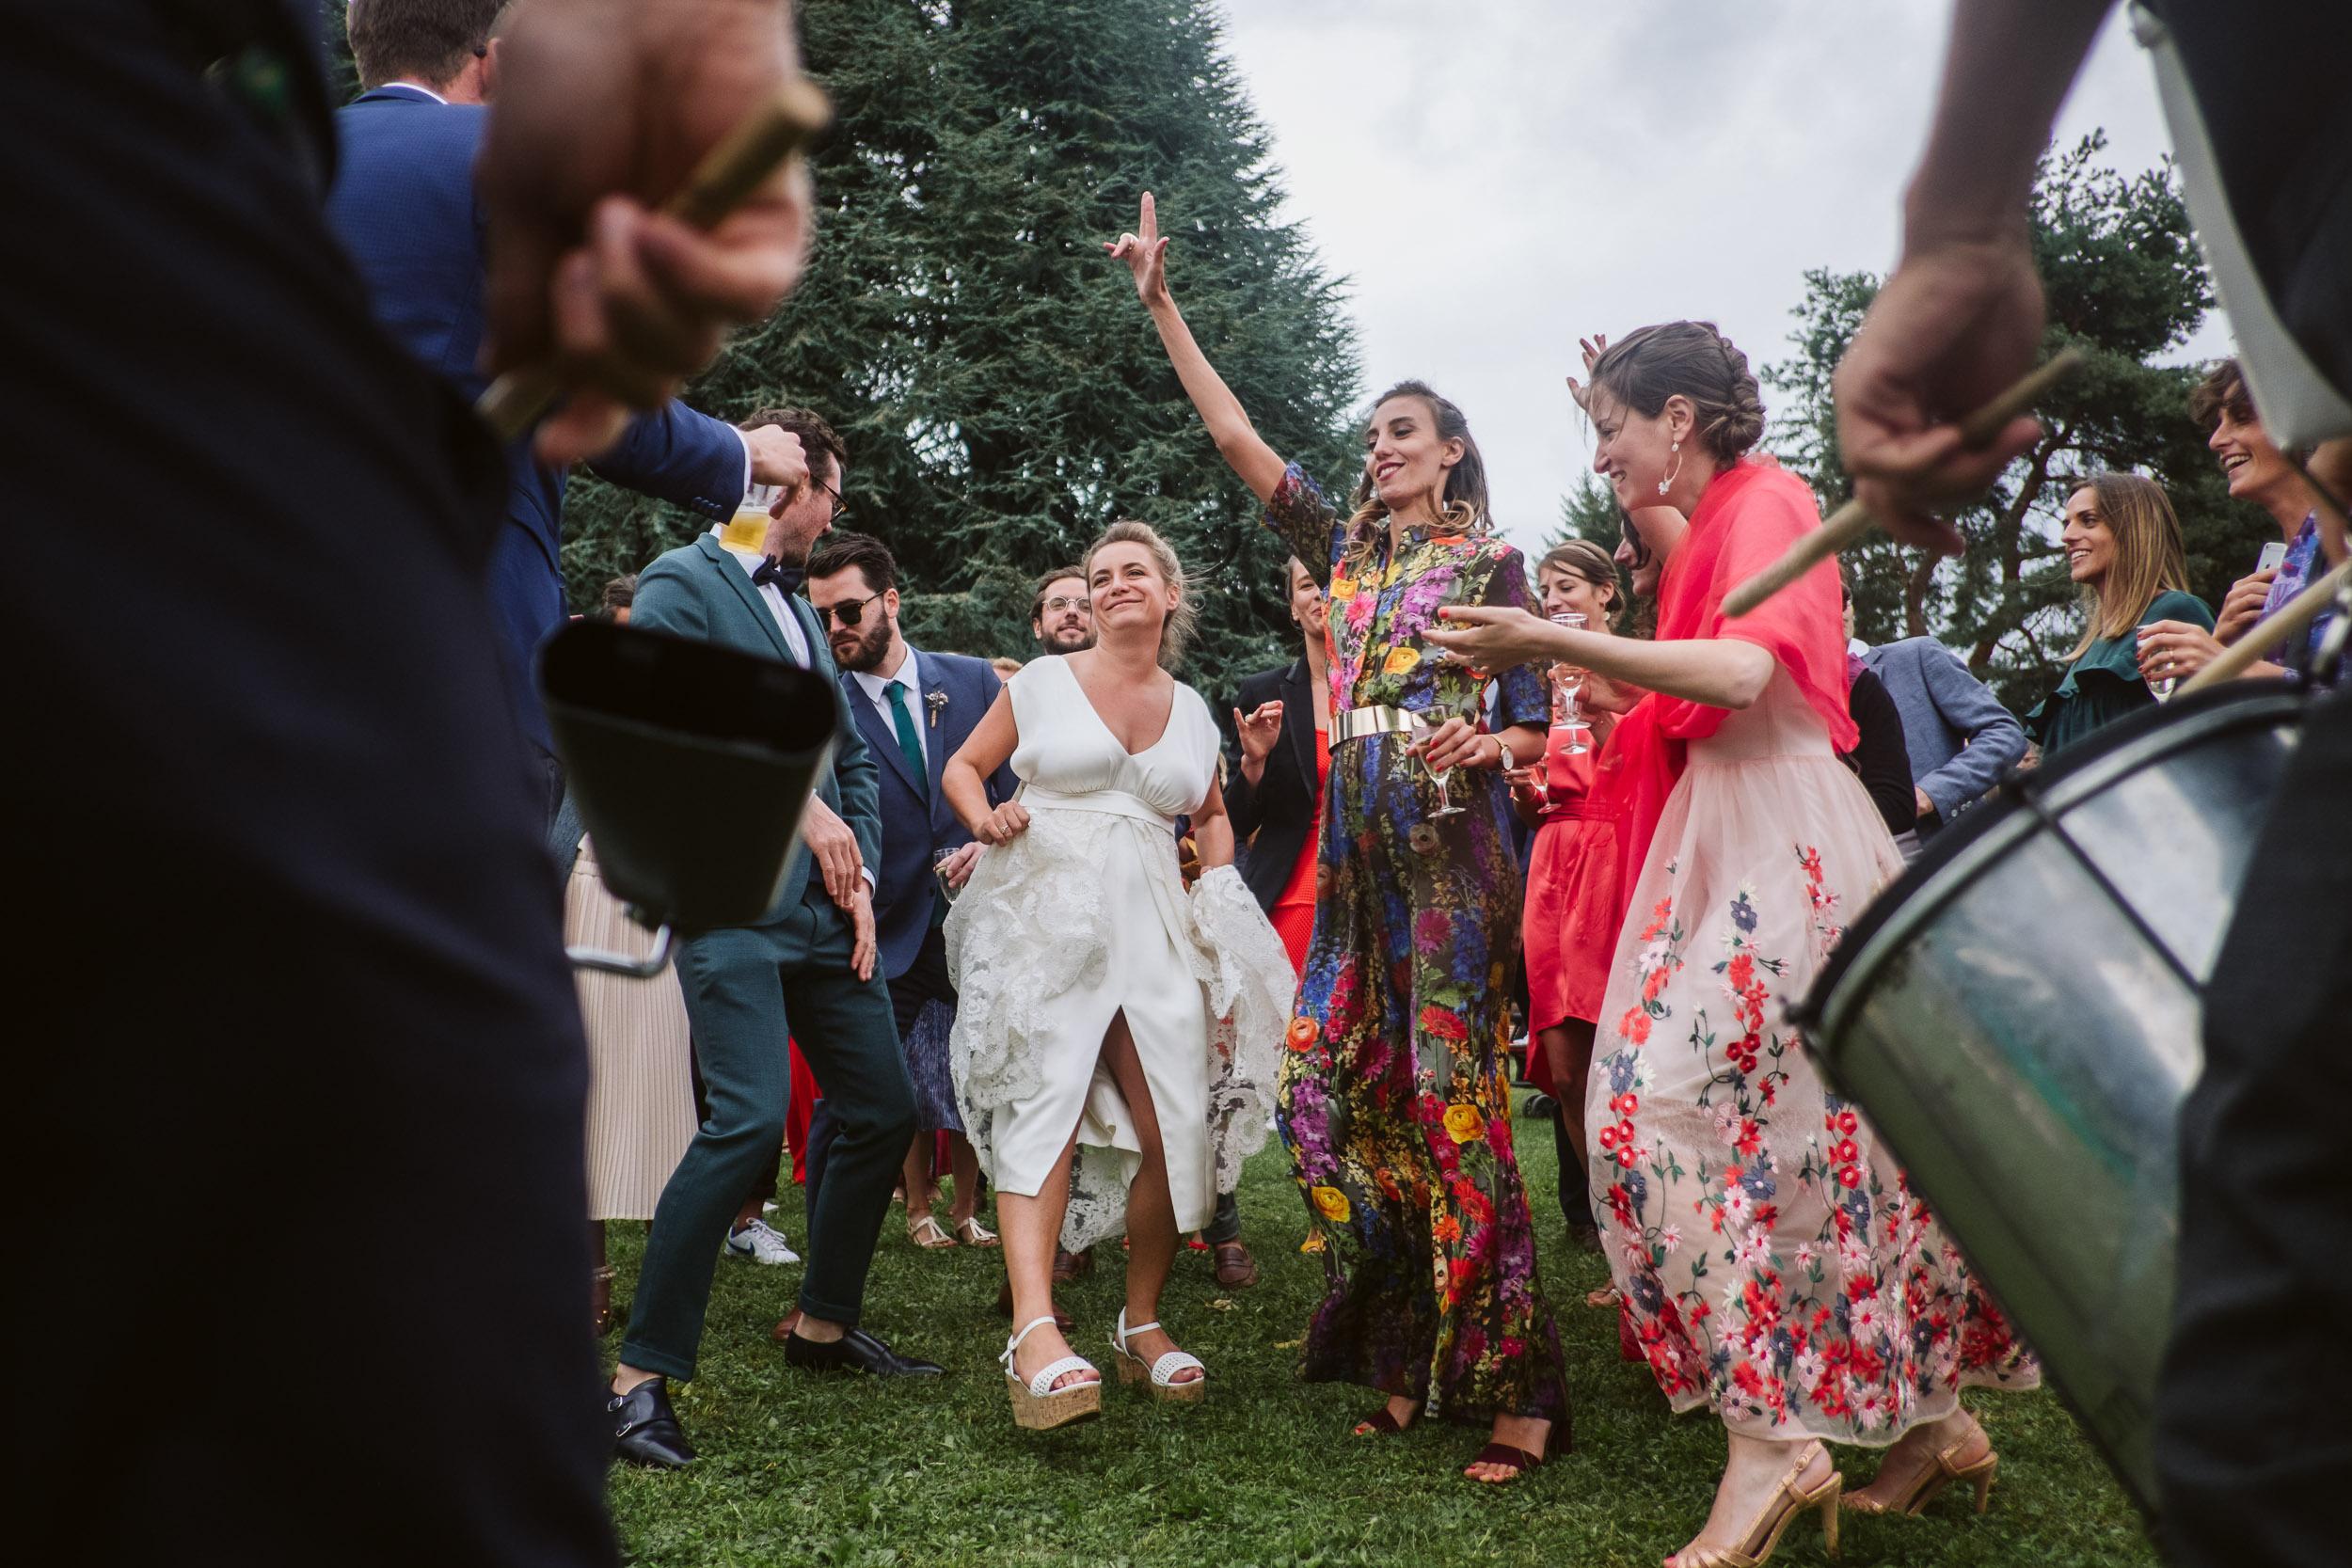 gerald-mattel-photographe-mariage-annecy-verrier-menthon-11.jpg